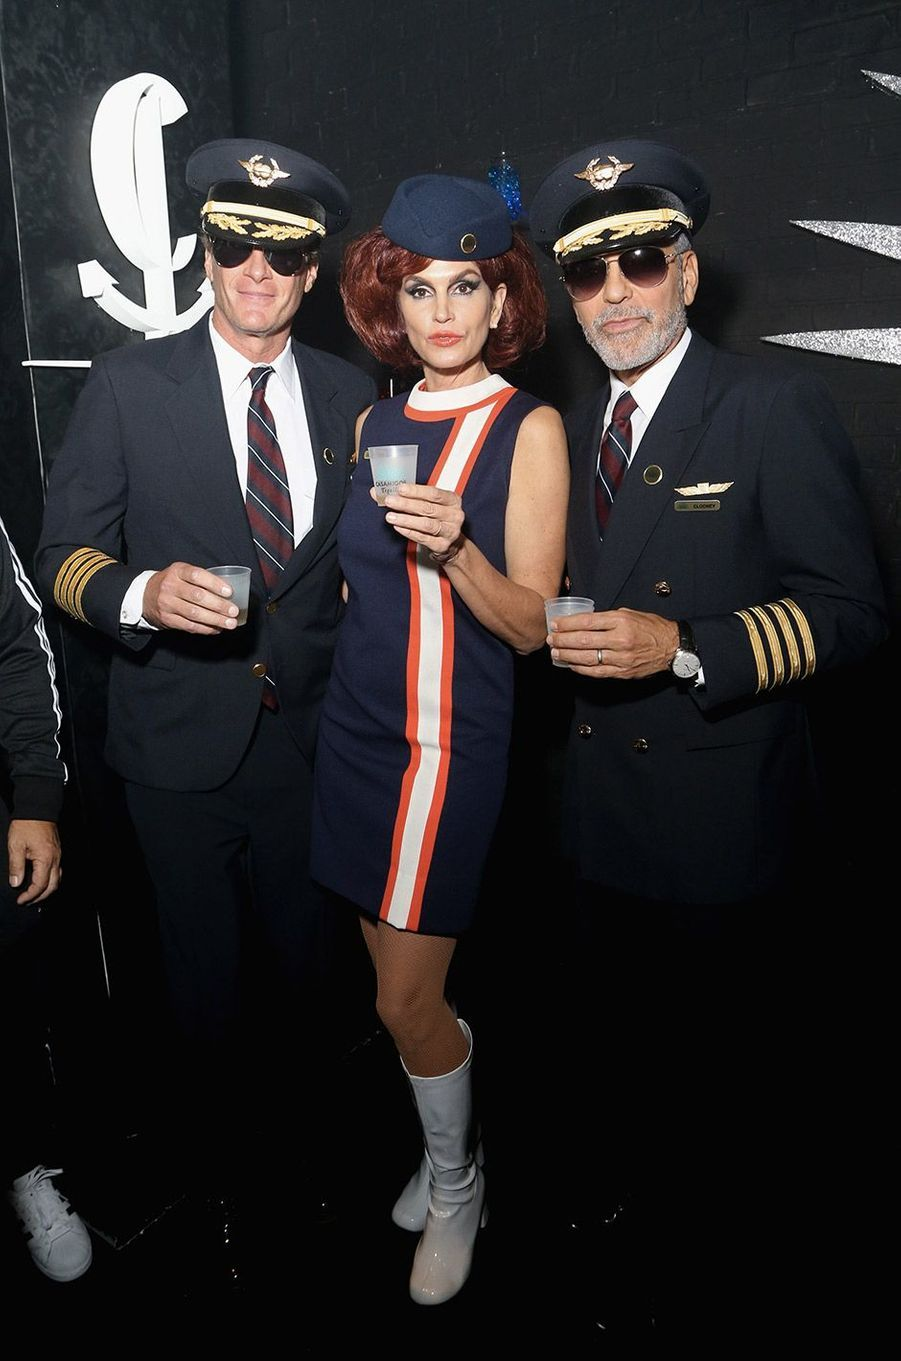 Rande Gerber, Cindy Crawford et George Clooney à la soirée Casamigos, à Las Vegas, samedi 26 octobre